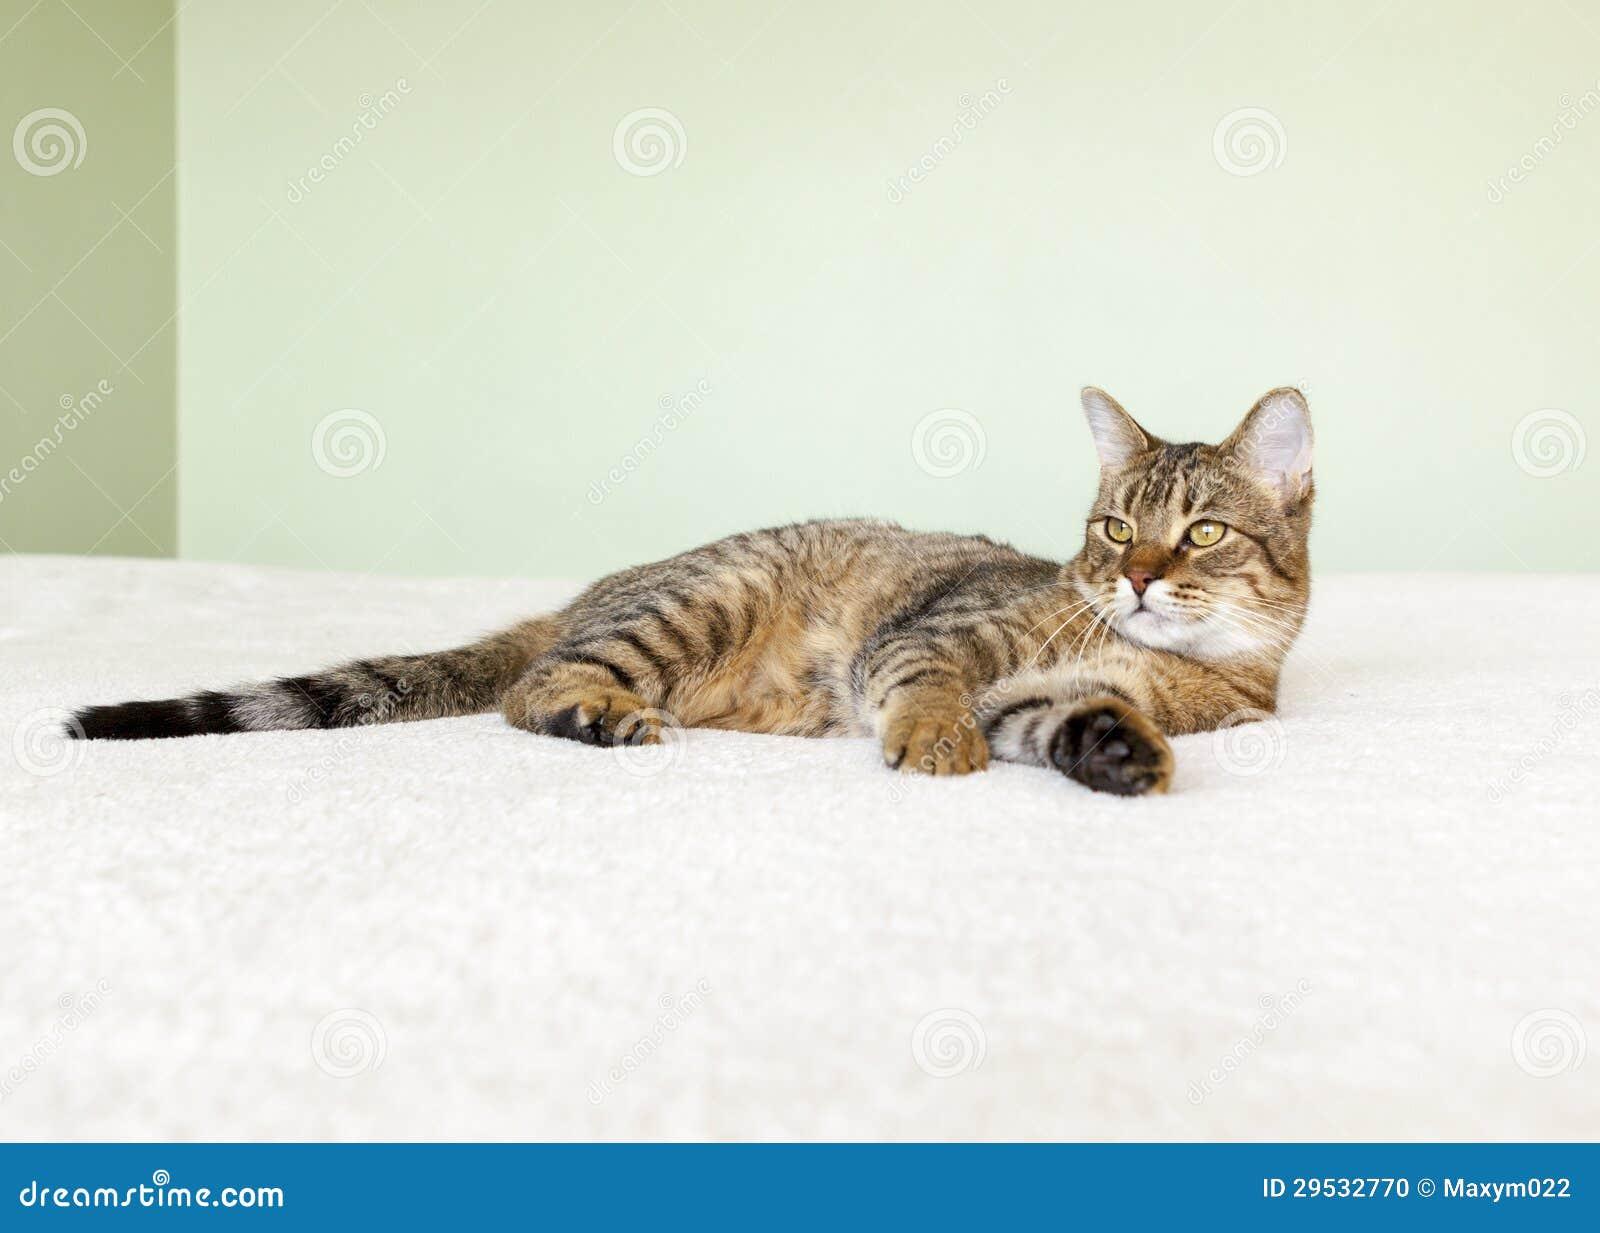 Gato de gato malhado pequeno